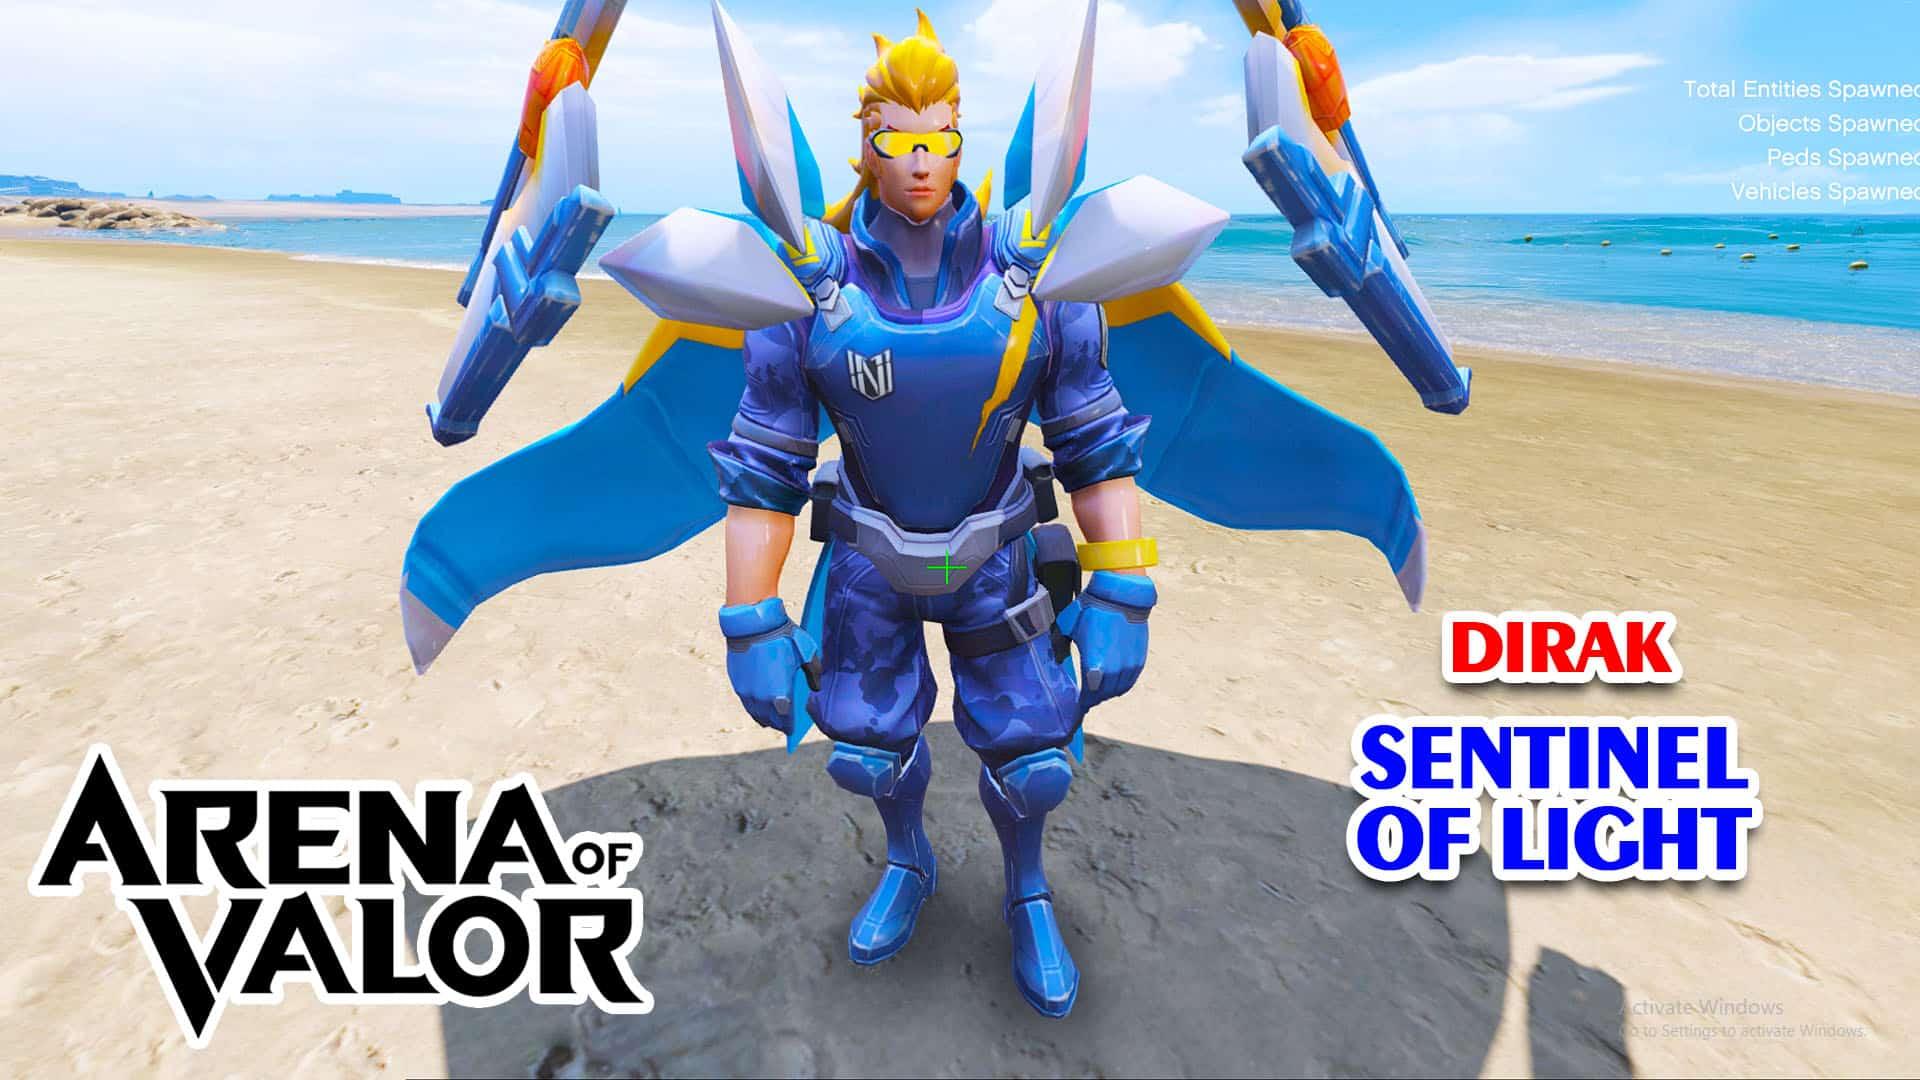 GTA 5 Mod Dirak Sentinel of Light Arena of Valor